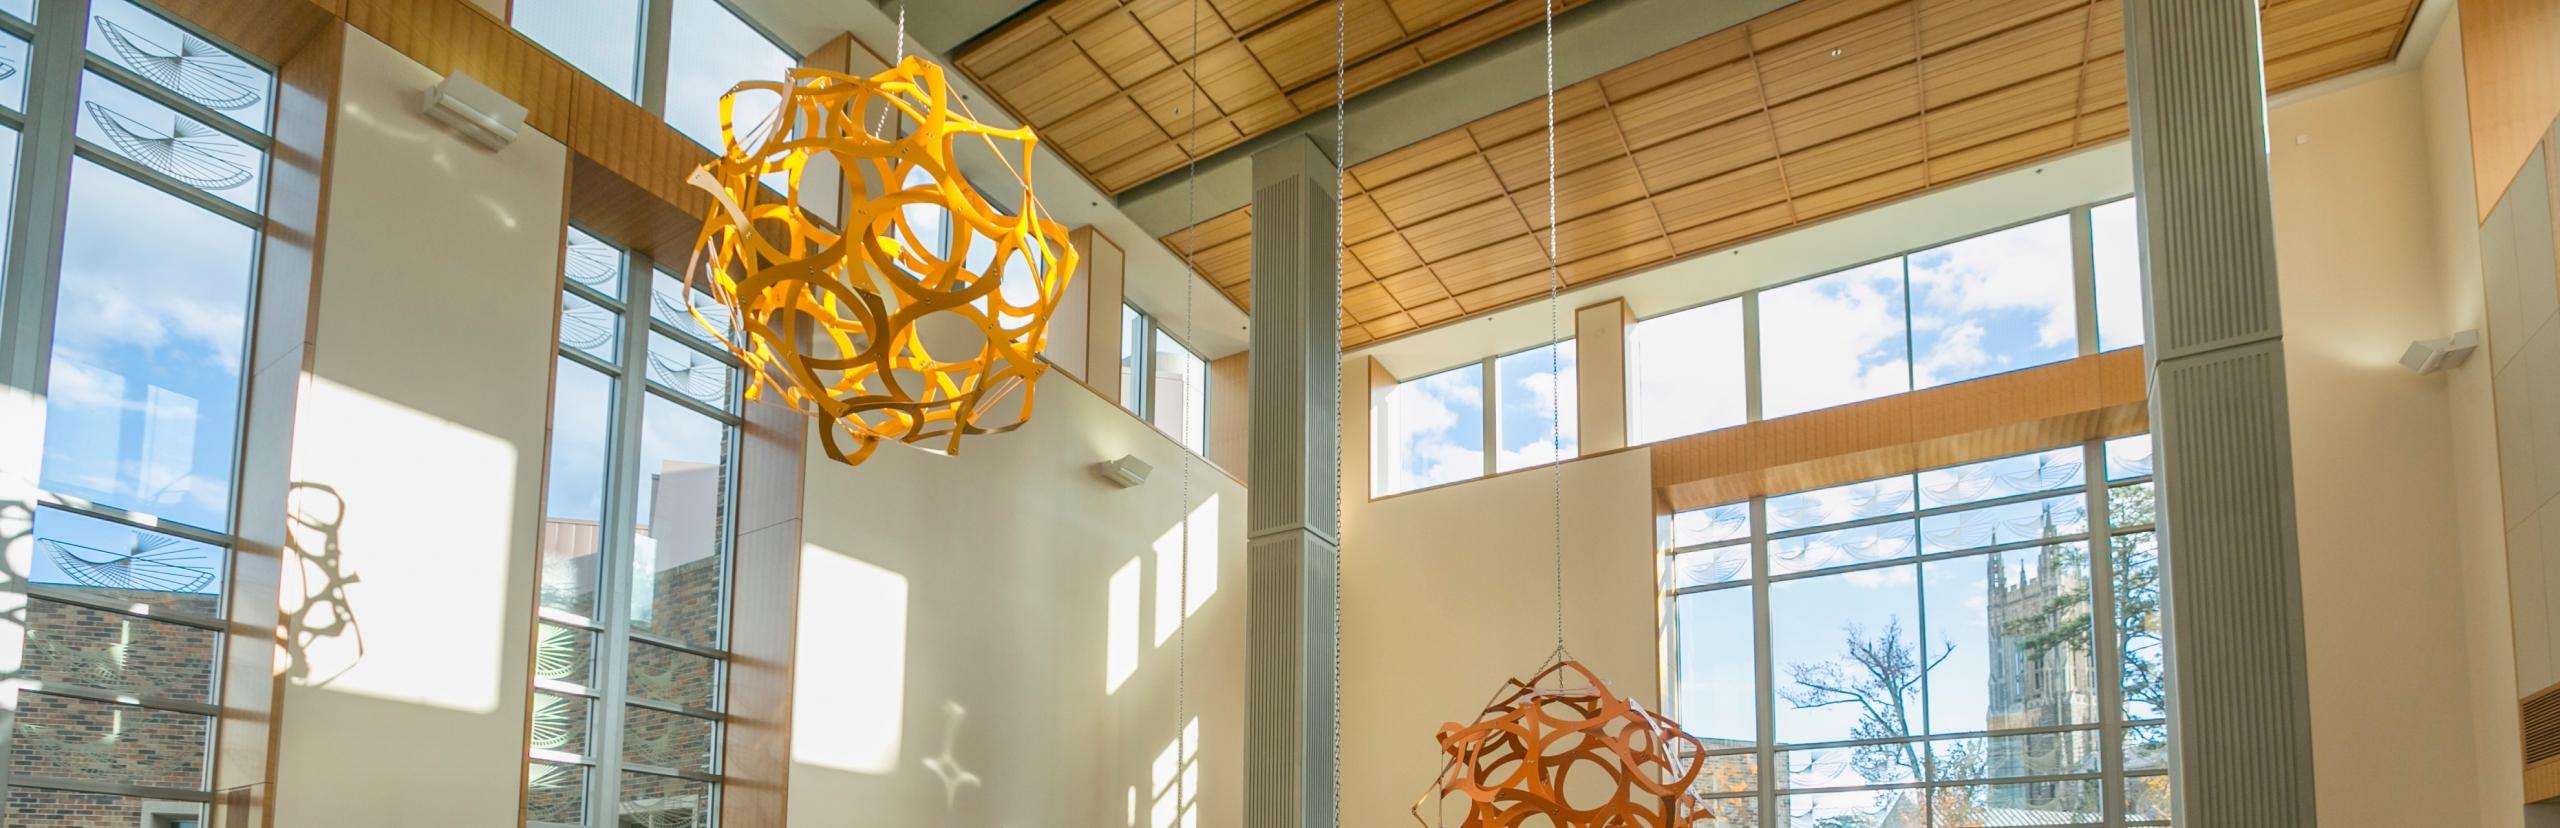 Fitzpatrick Center interior